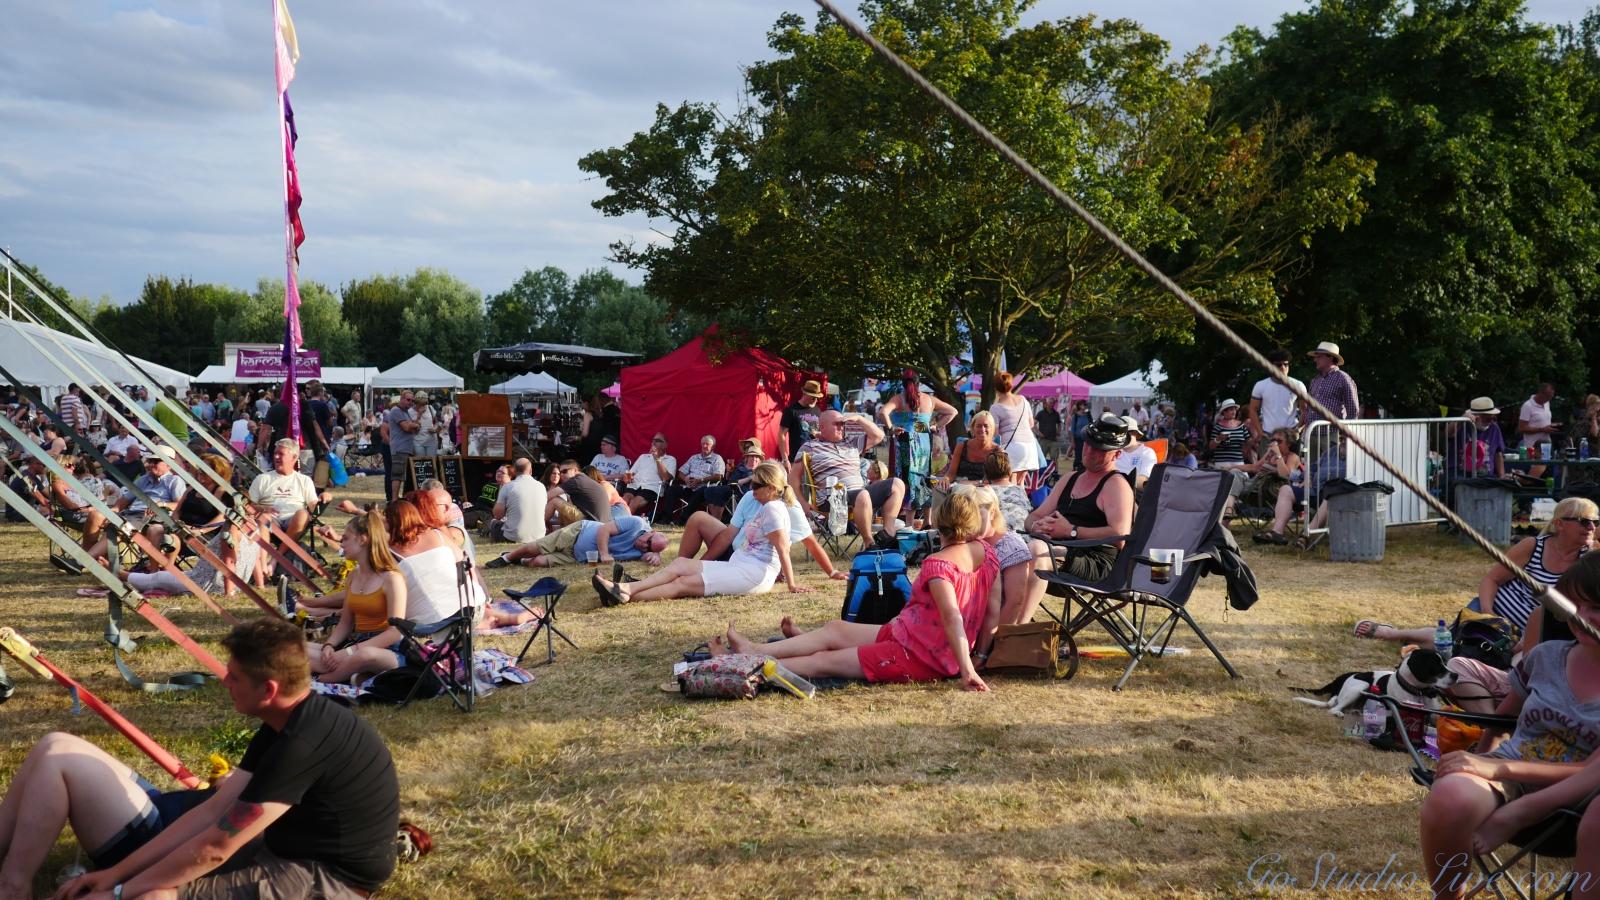 Upton Festival